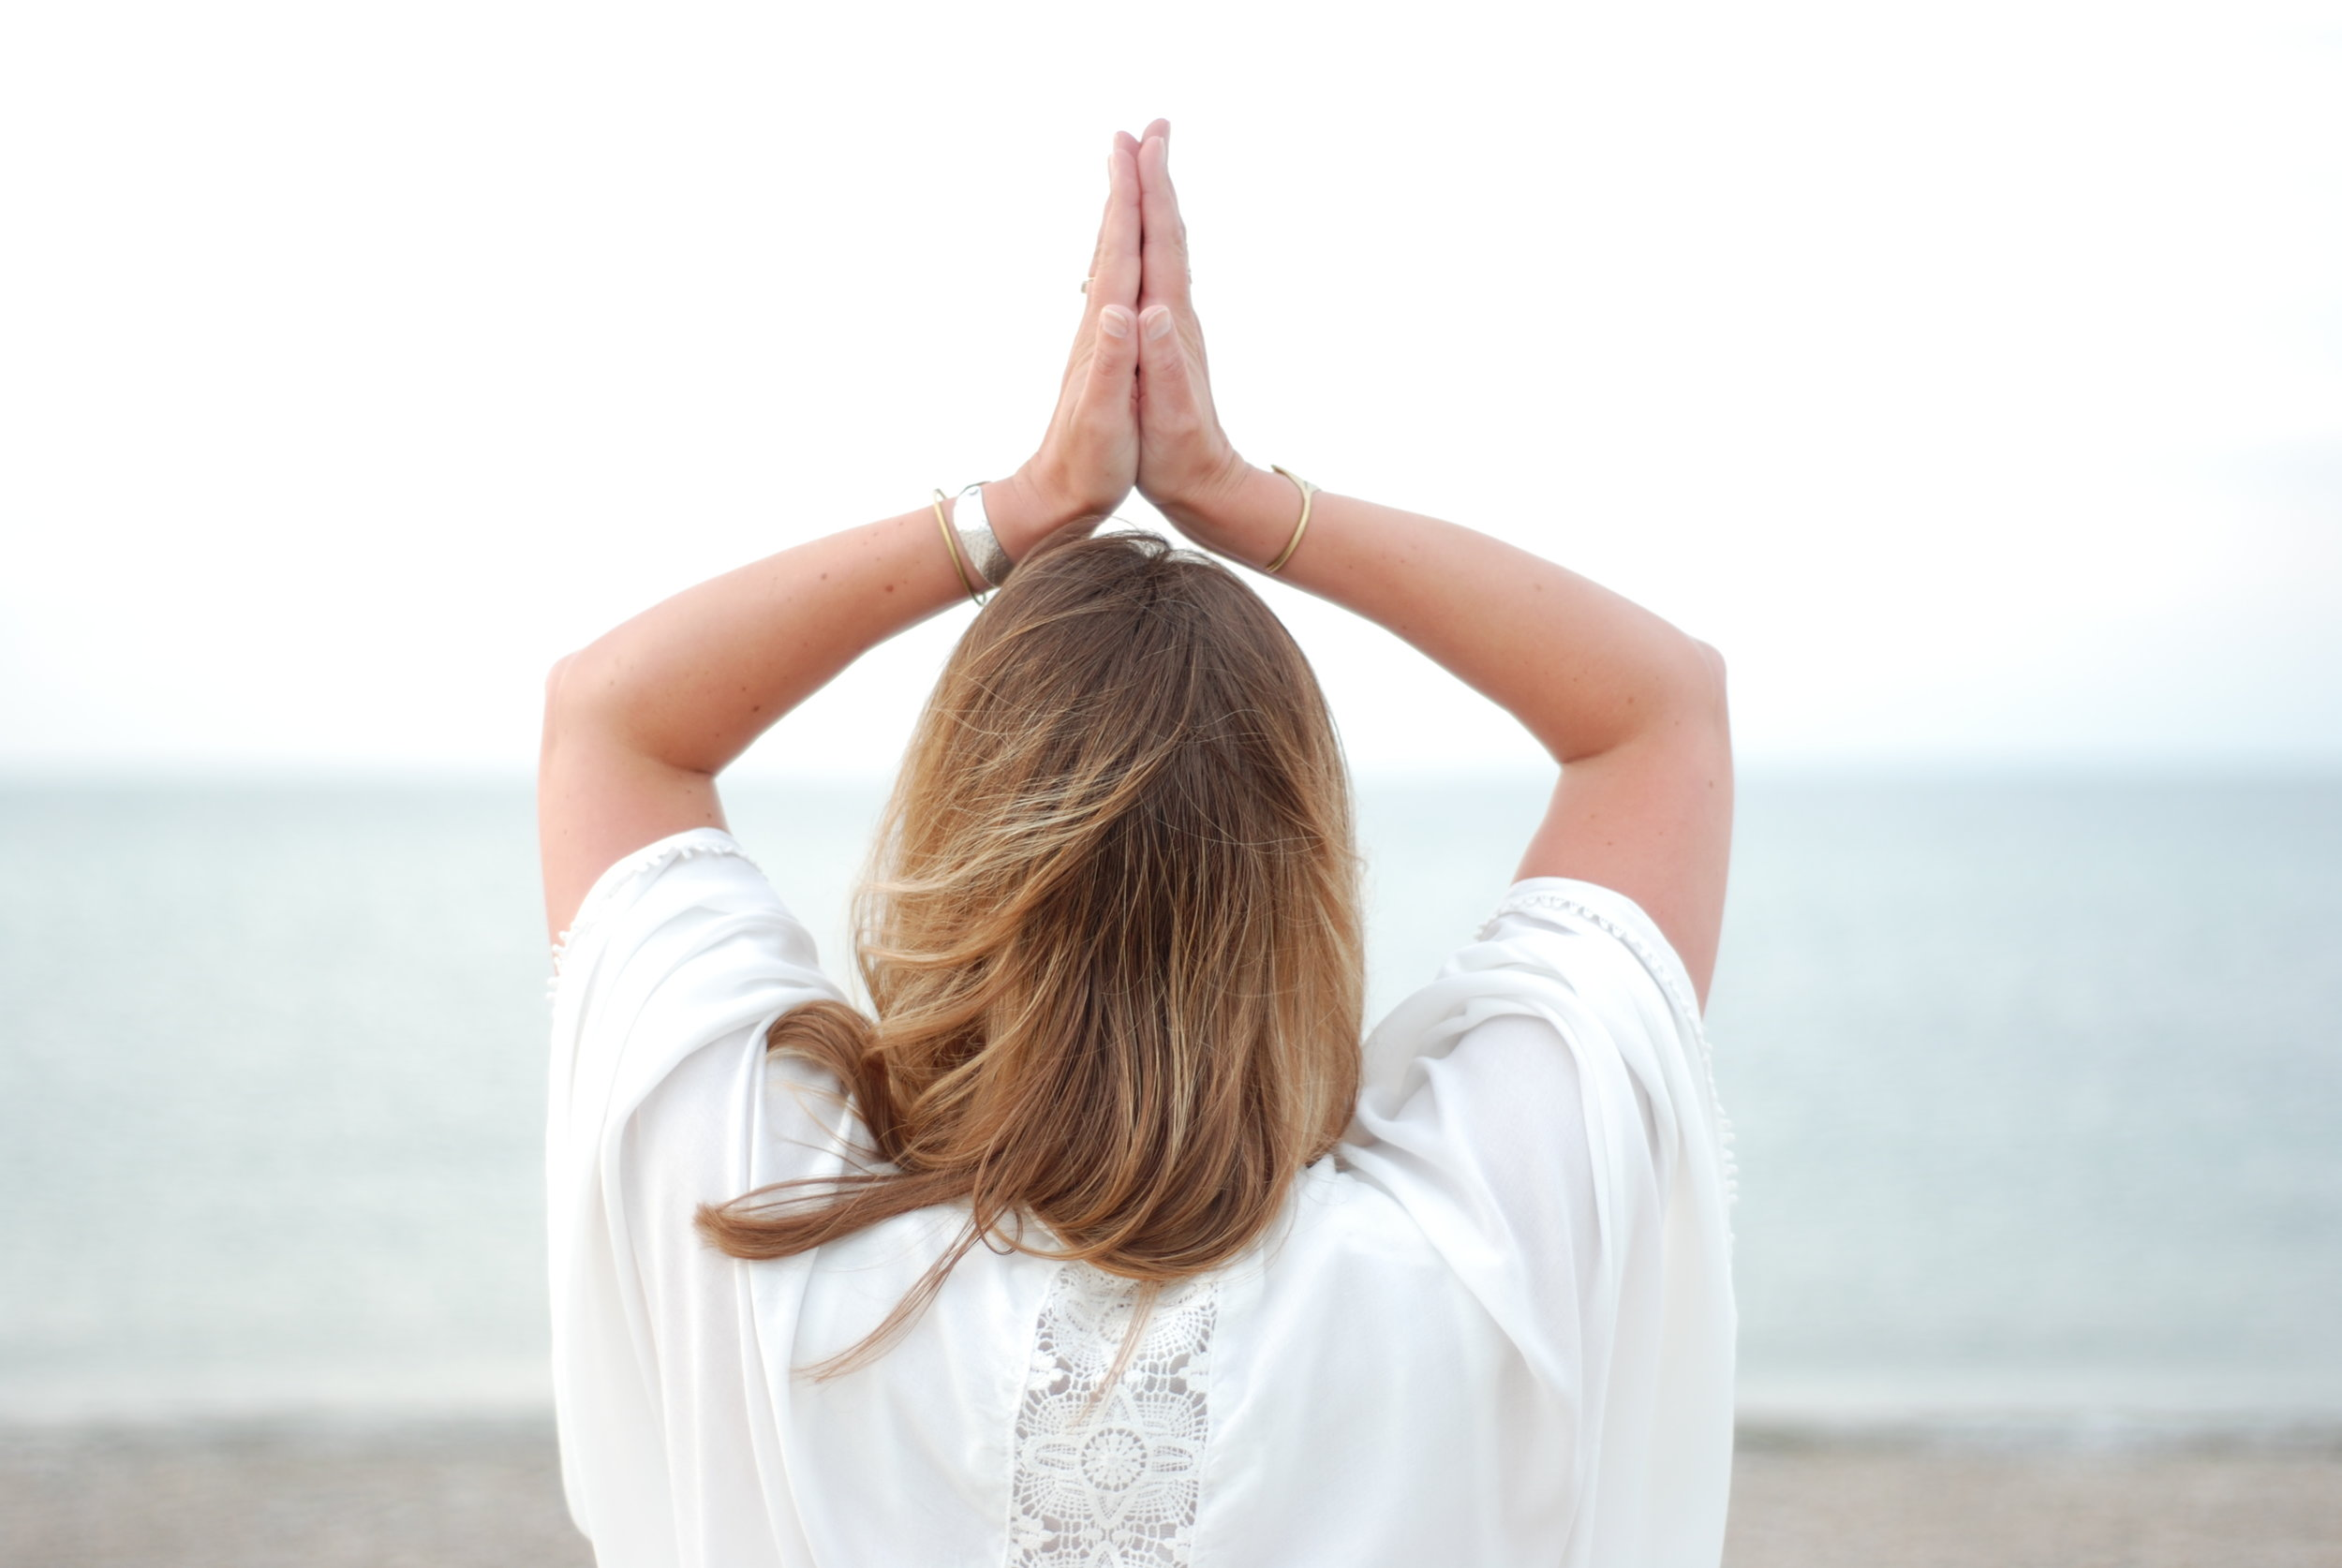 danne-dzenawagis-yoga.JPG